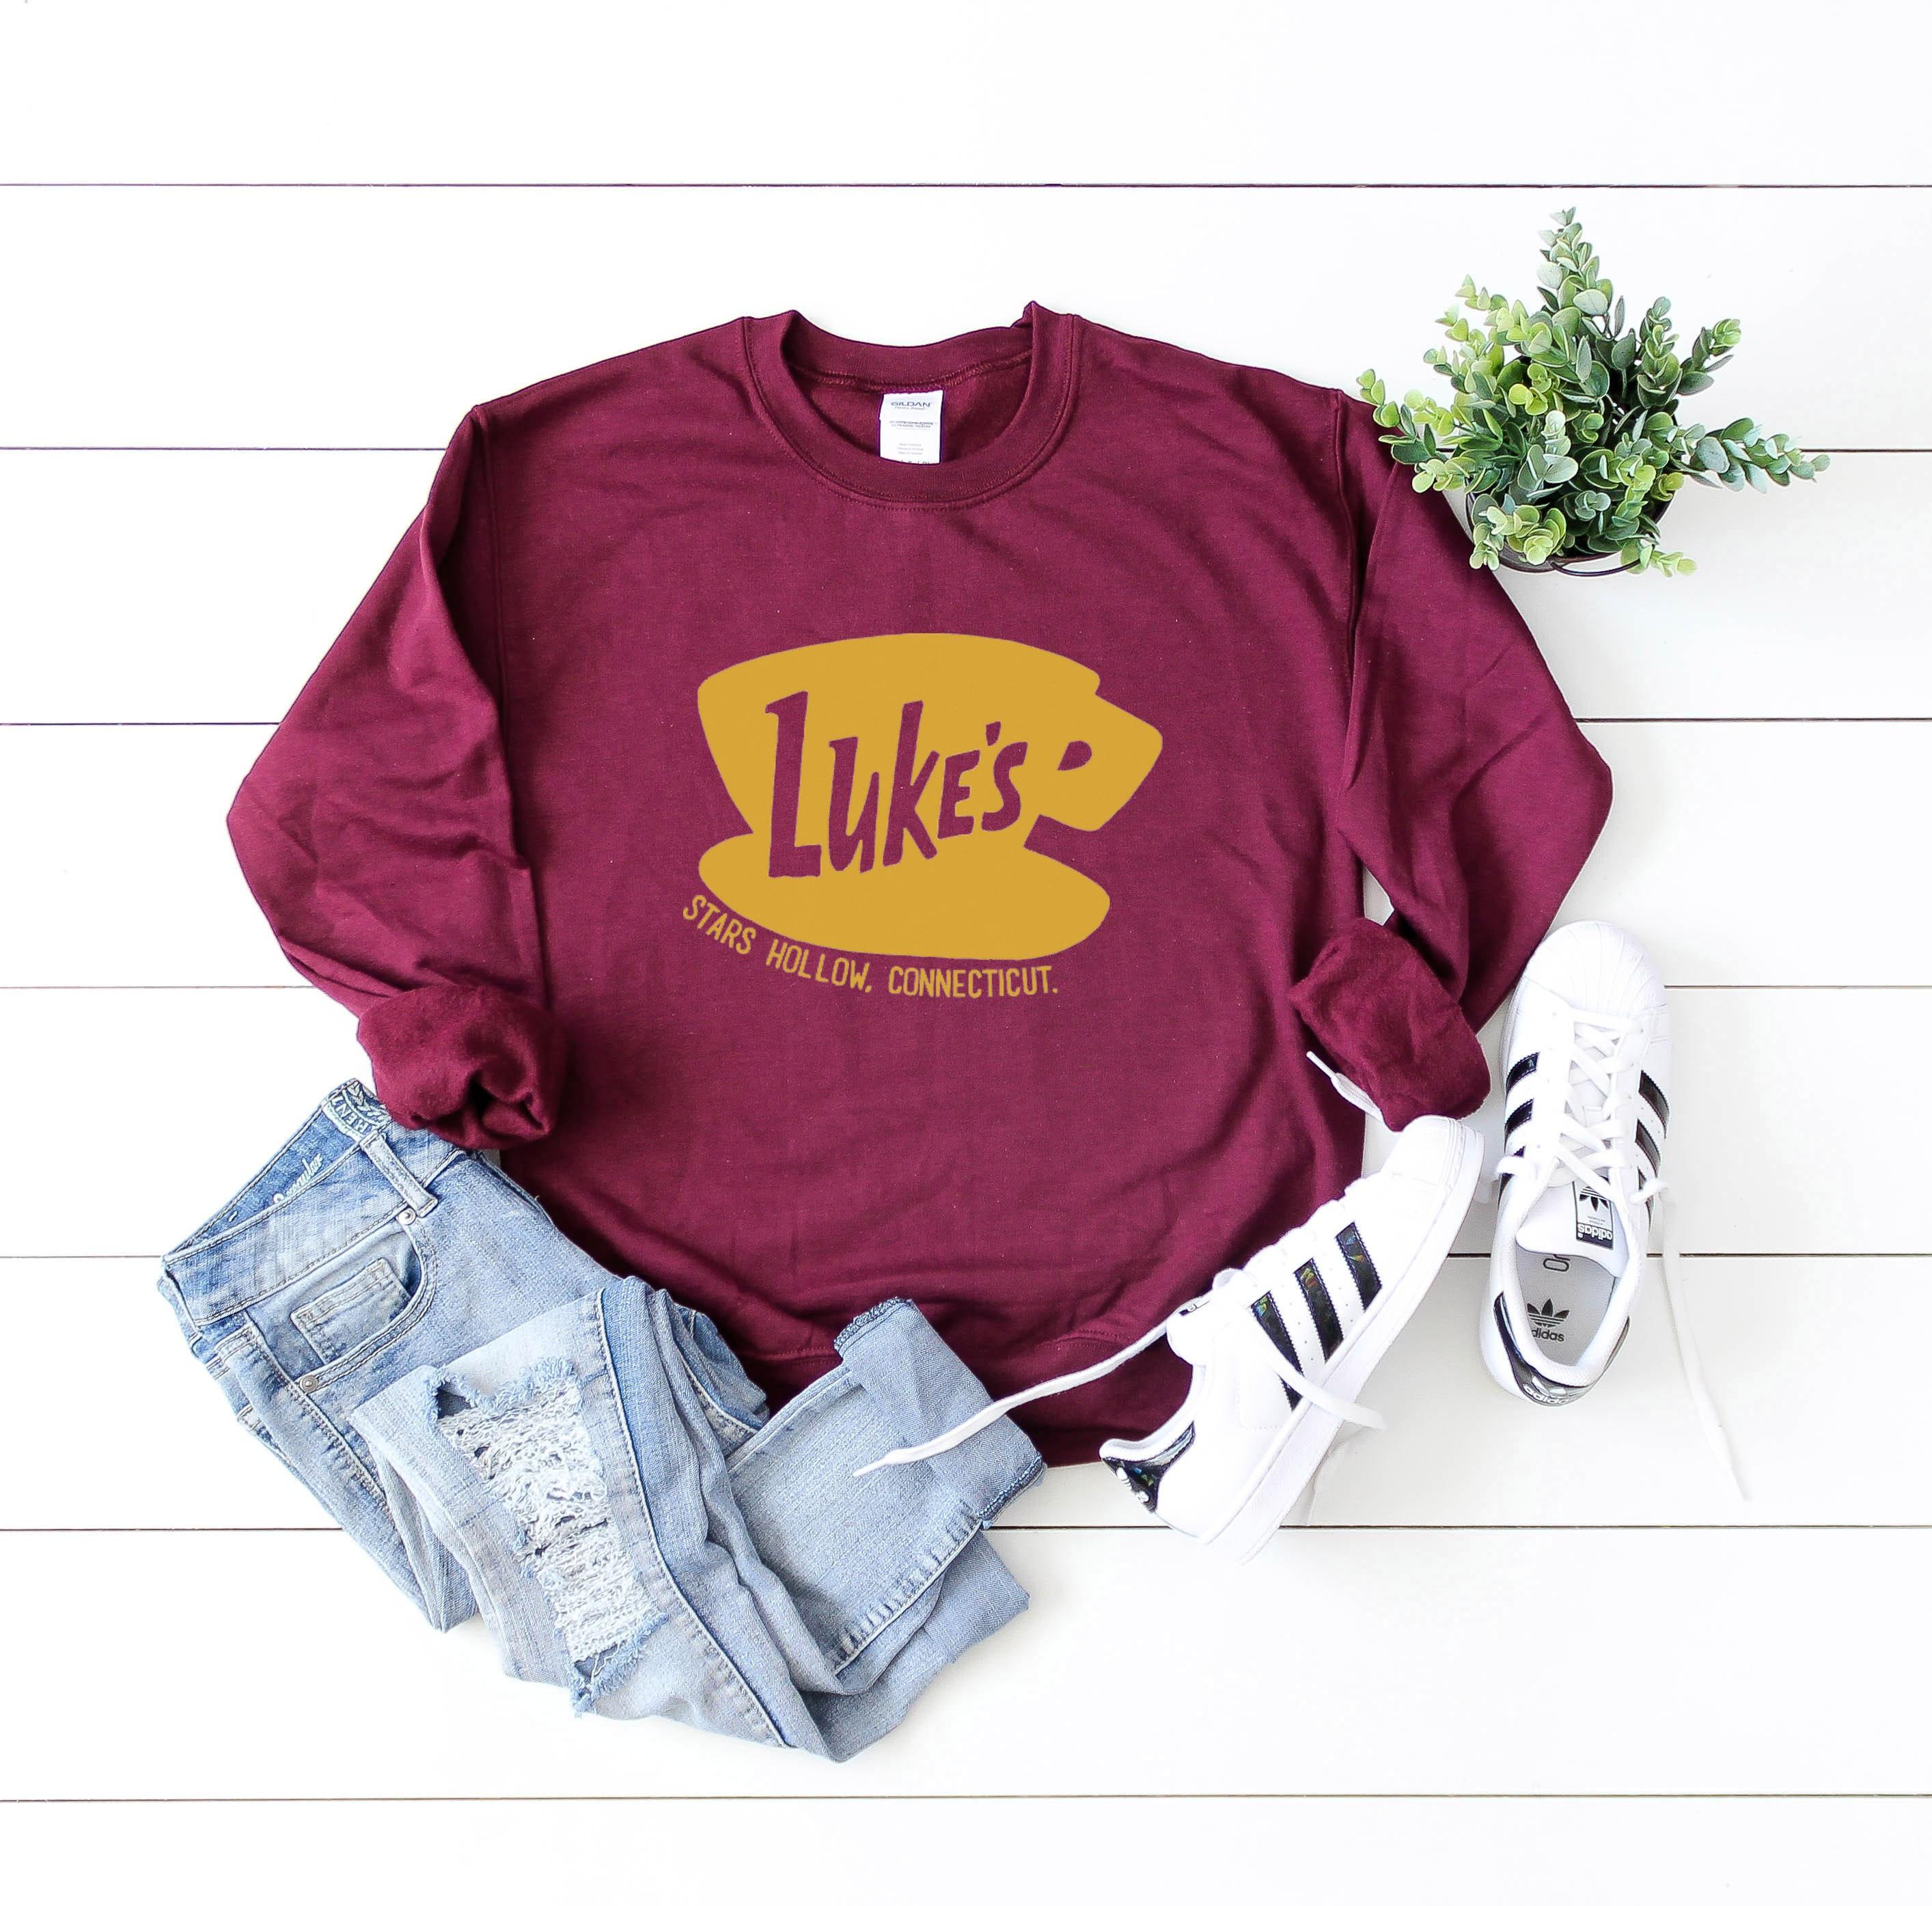 3ac269d6a ... Crewneck Sweatshirt - Gilmore Girls Luke's Diner - Stars Hollow Shirt -  Lukes Coffee Shop. gallery photo gallery photo